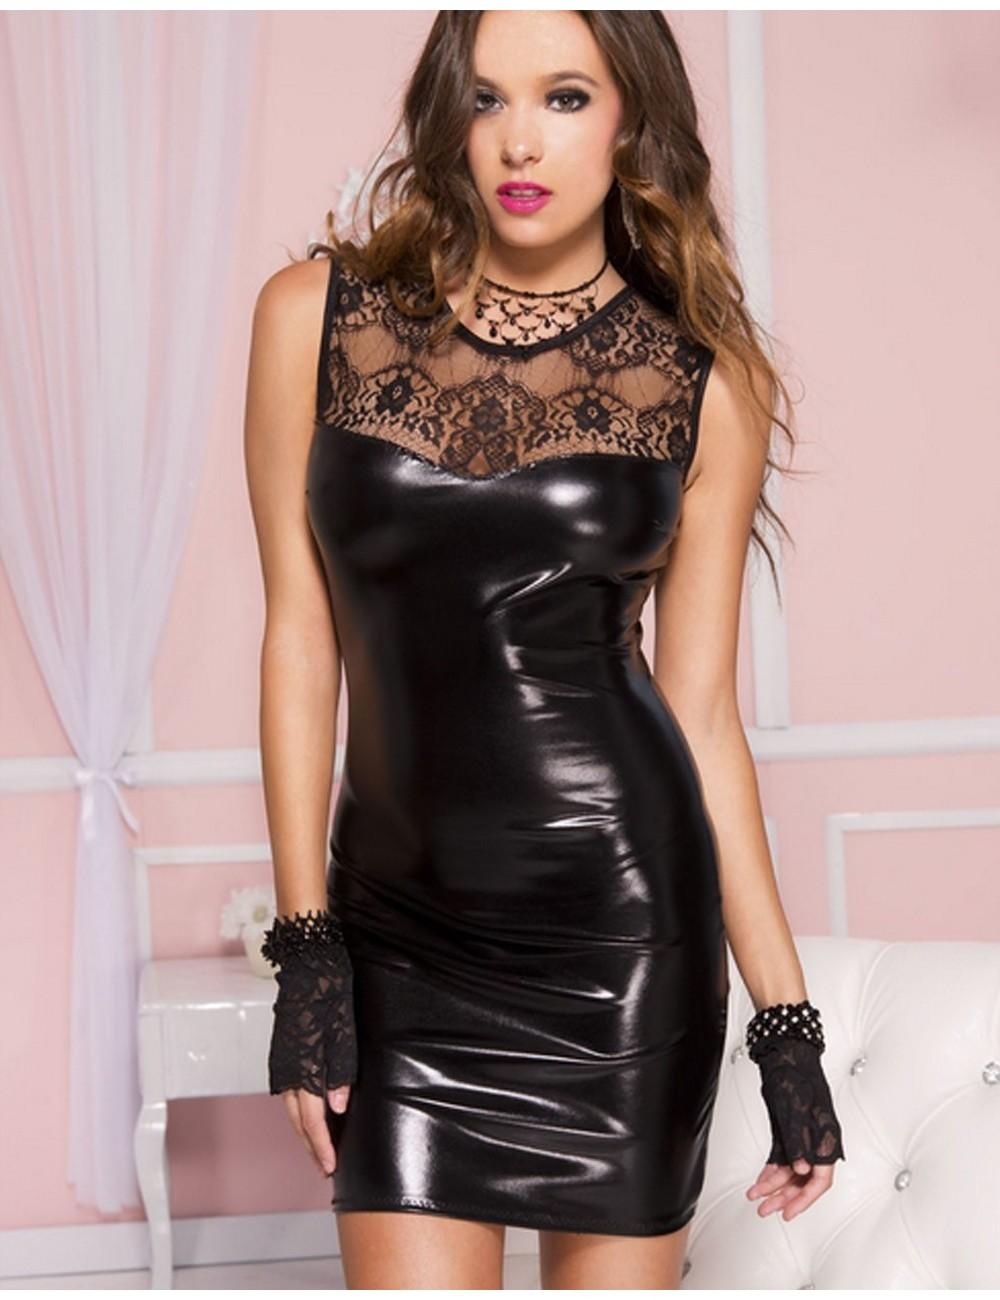 Lingerie - Robes et jupes sexy - Robe courte sexy wetlook noir brillant haut dentelle - ML60007BLK - Music Legs